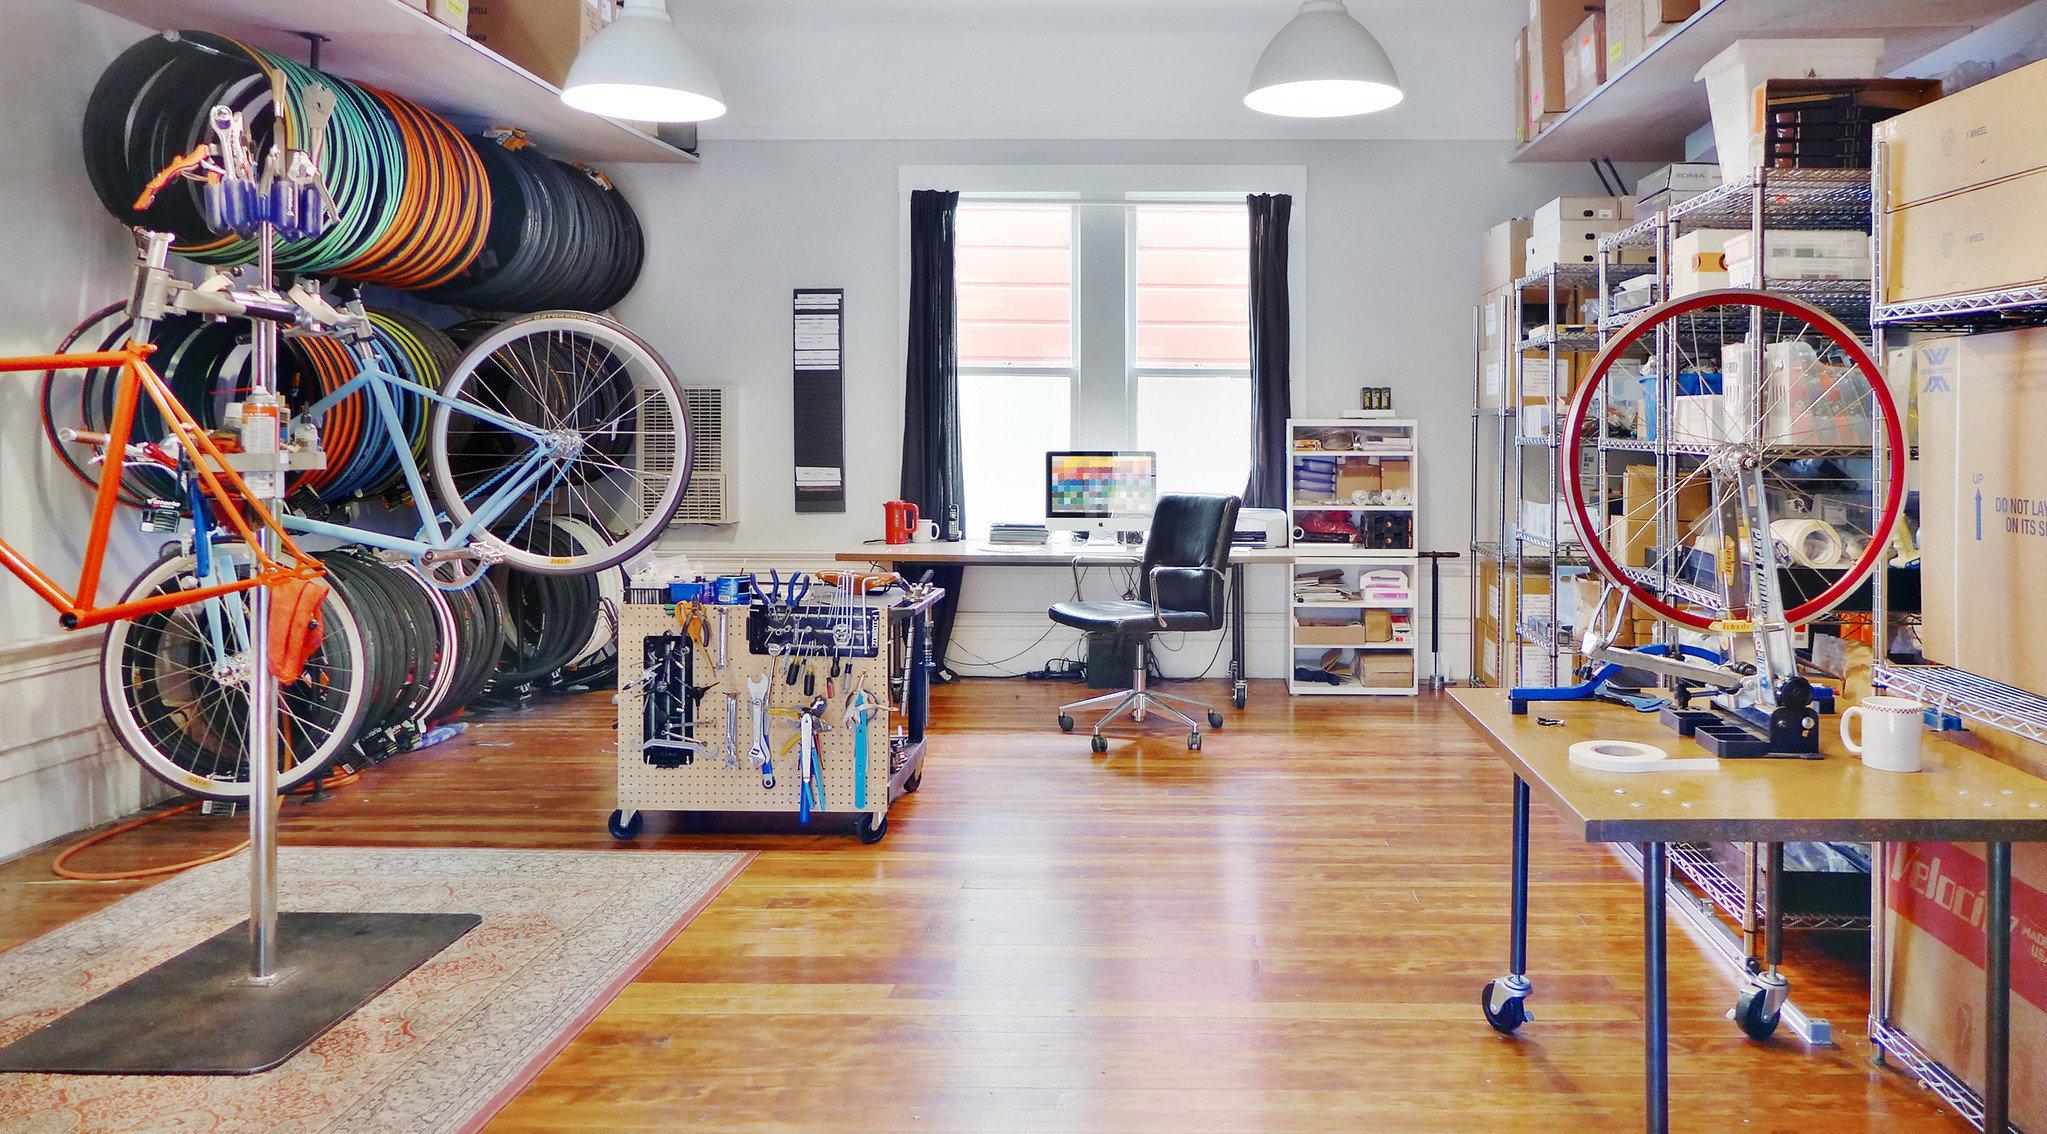 Mission Bicycle Workshop